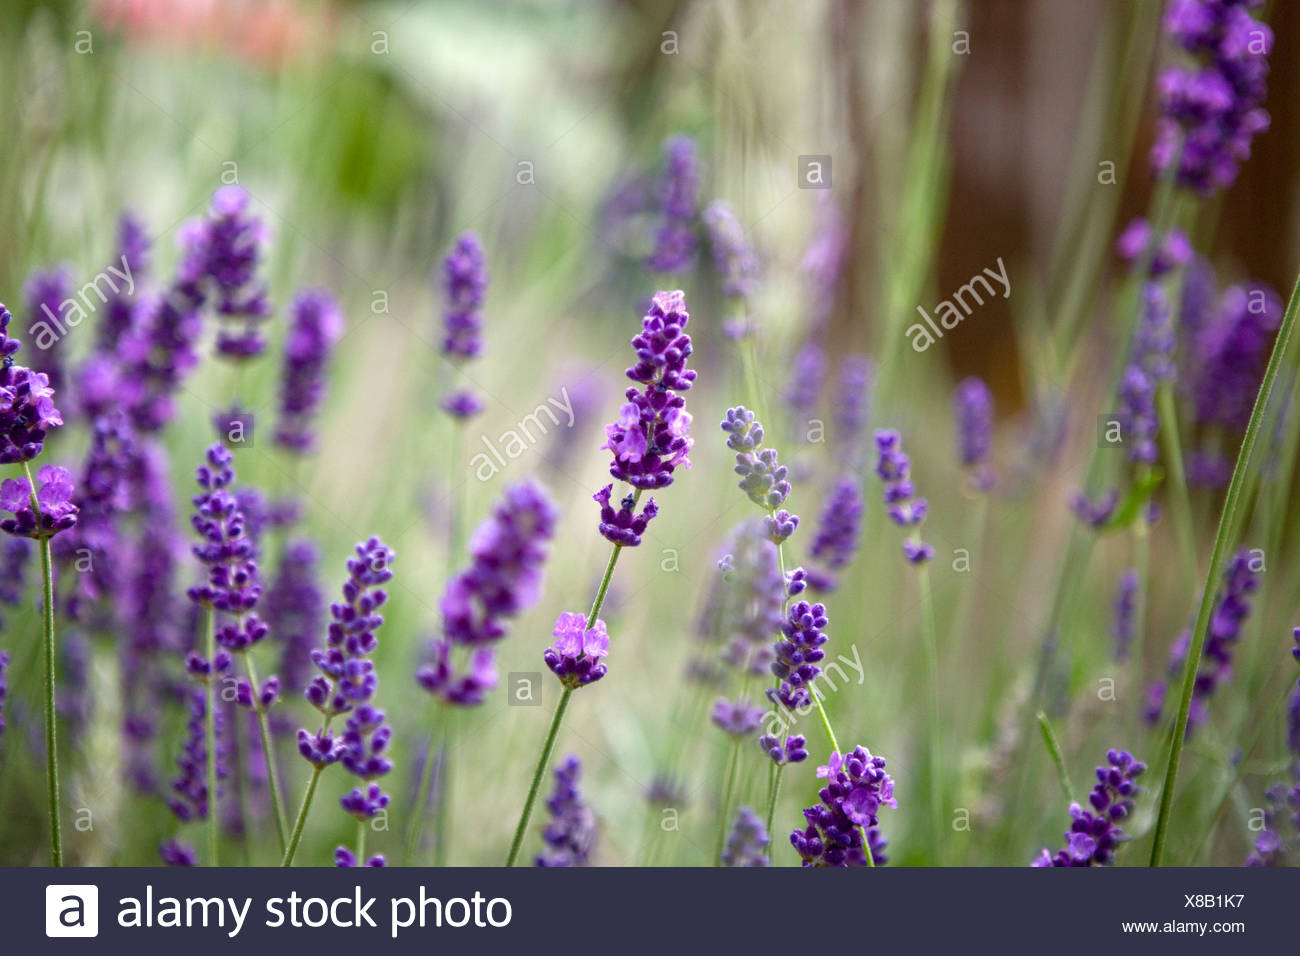 A Lavender plant - Stock Image